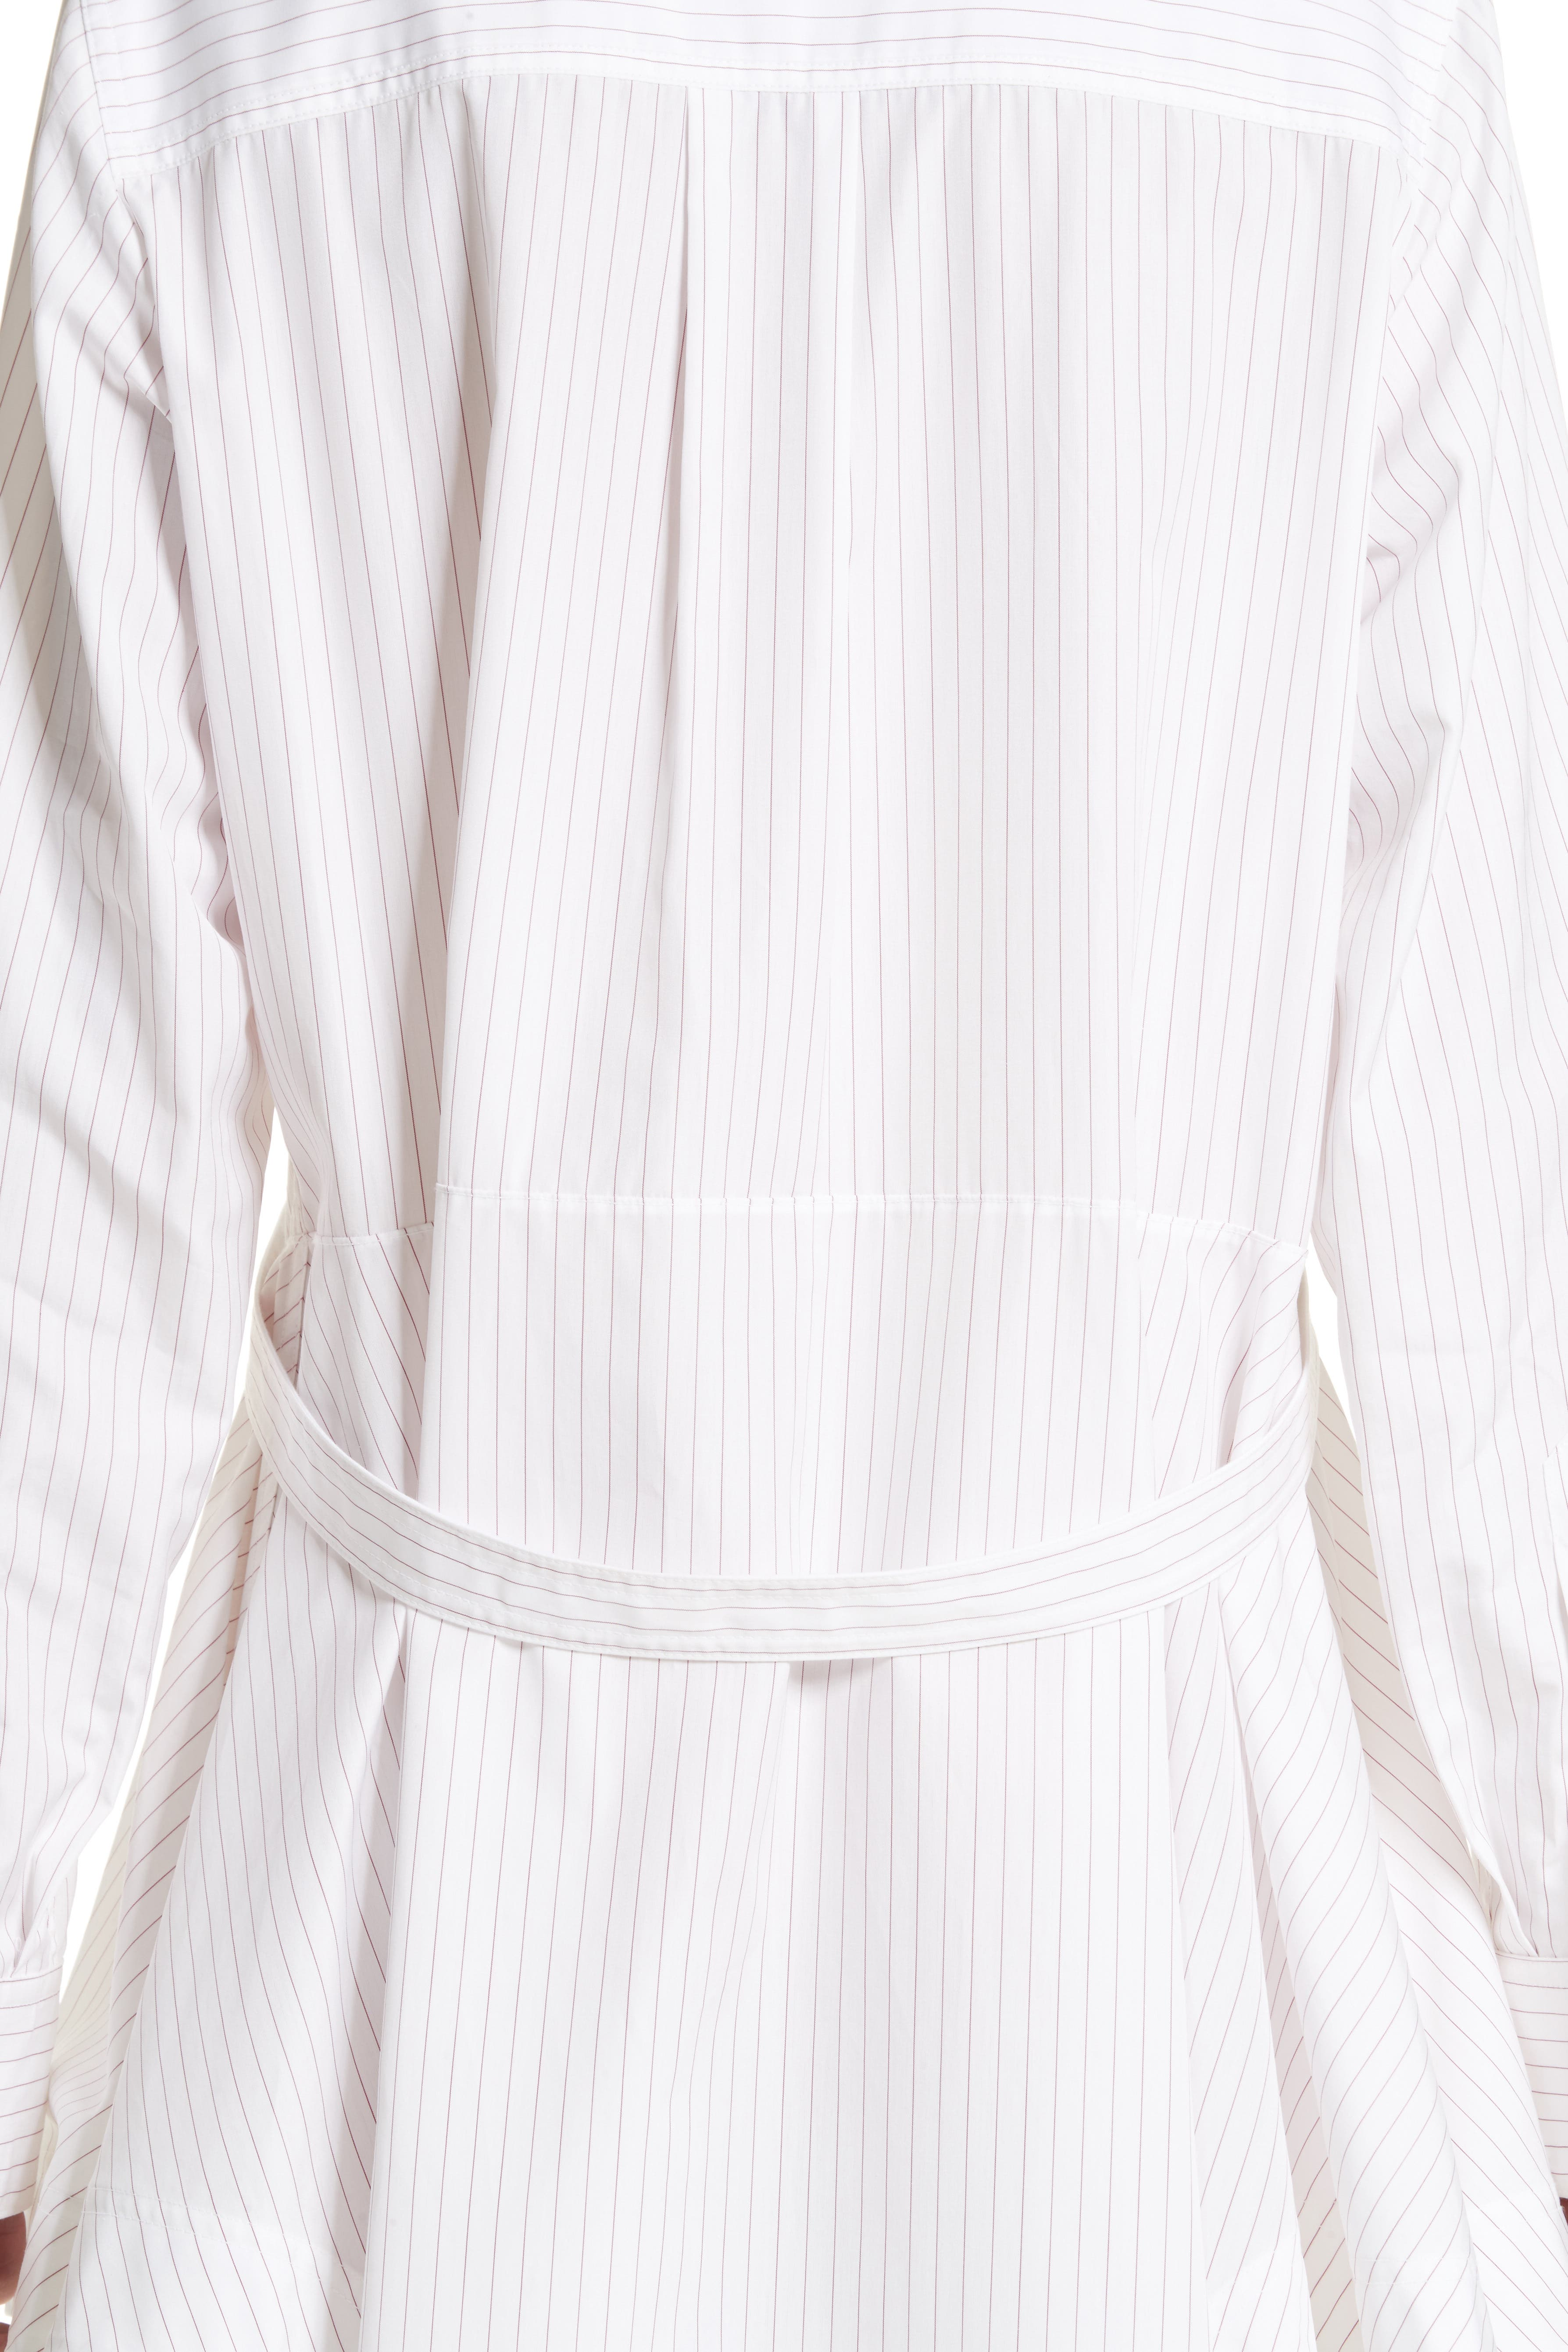 Pinstripe Cotton Poplin Dress,                             Alternate thumbnail 5, color,                             100